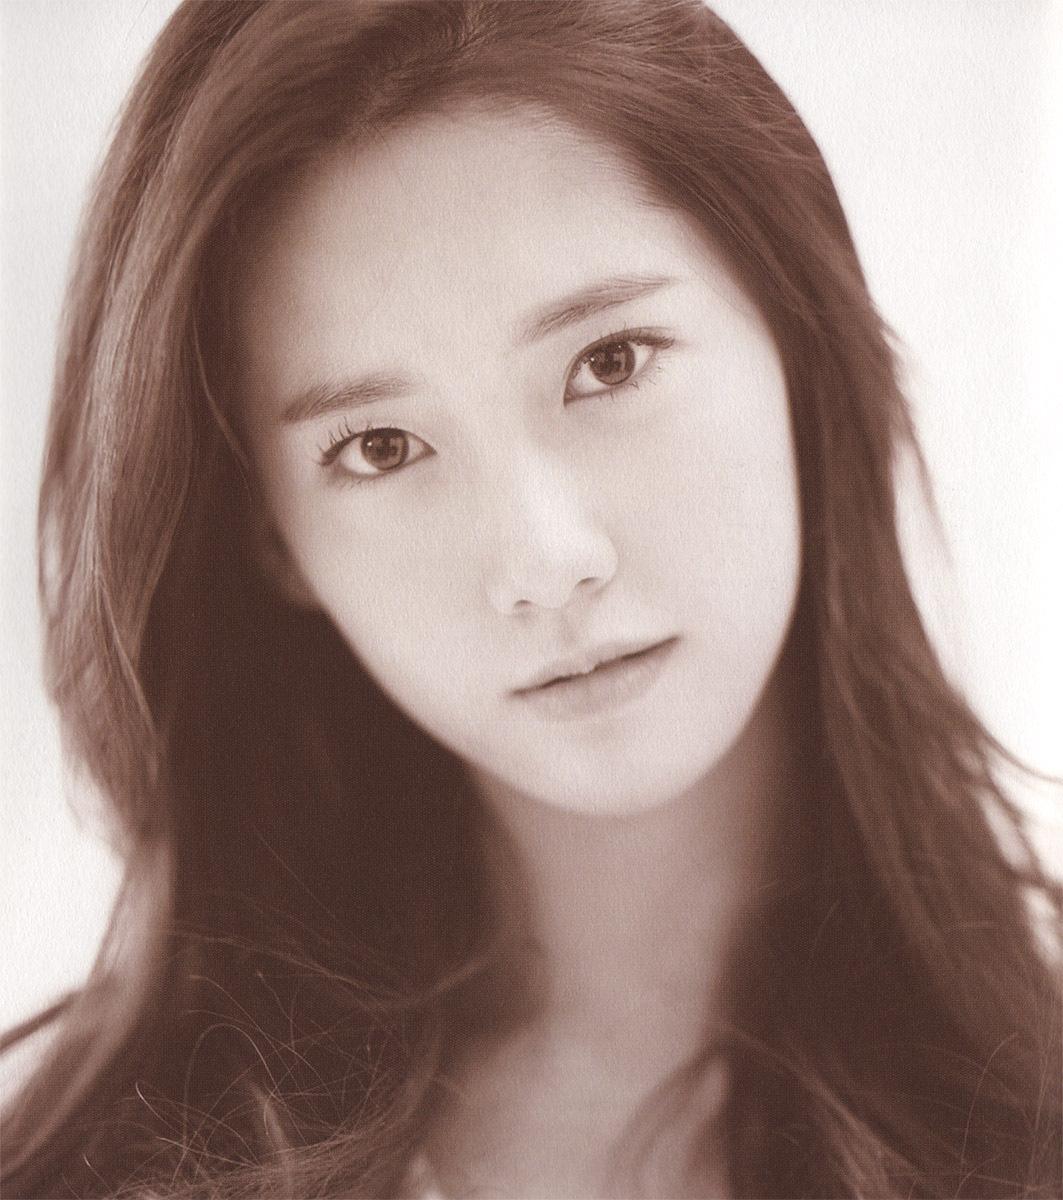 Yoona Gee Ver. 3 - girls-generation-snsd photo